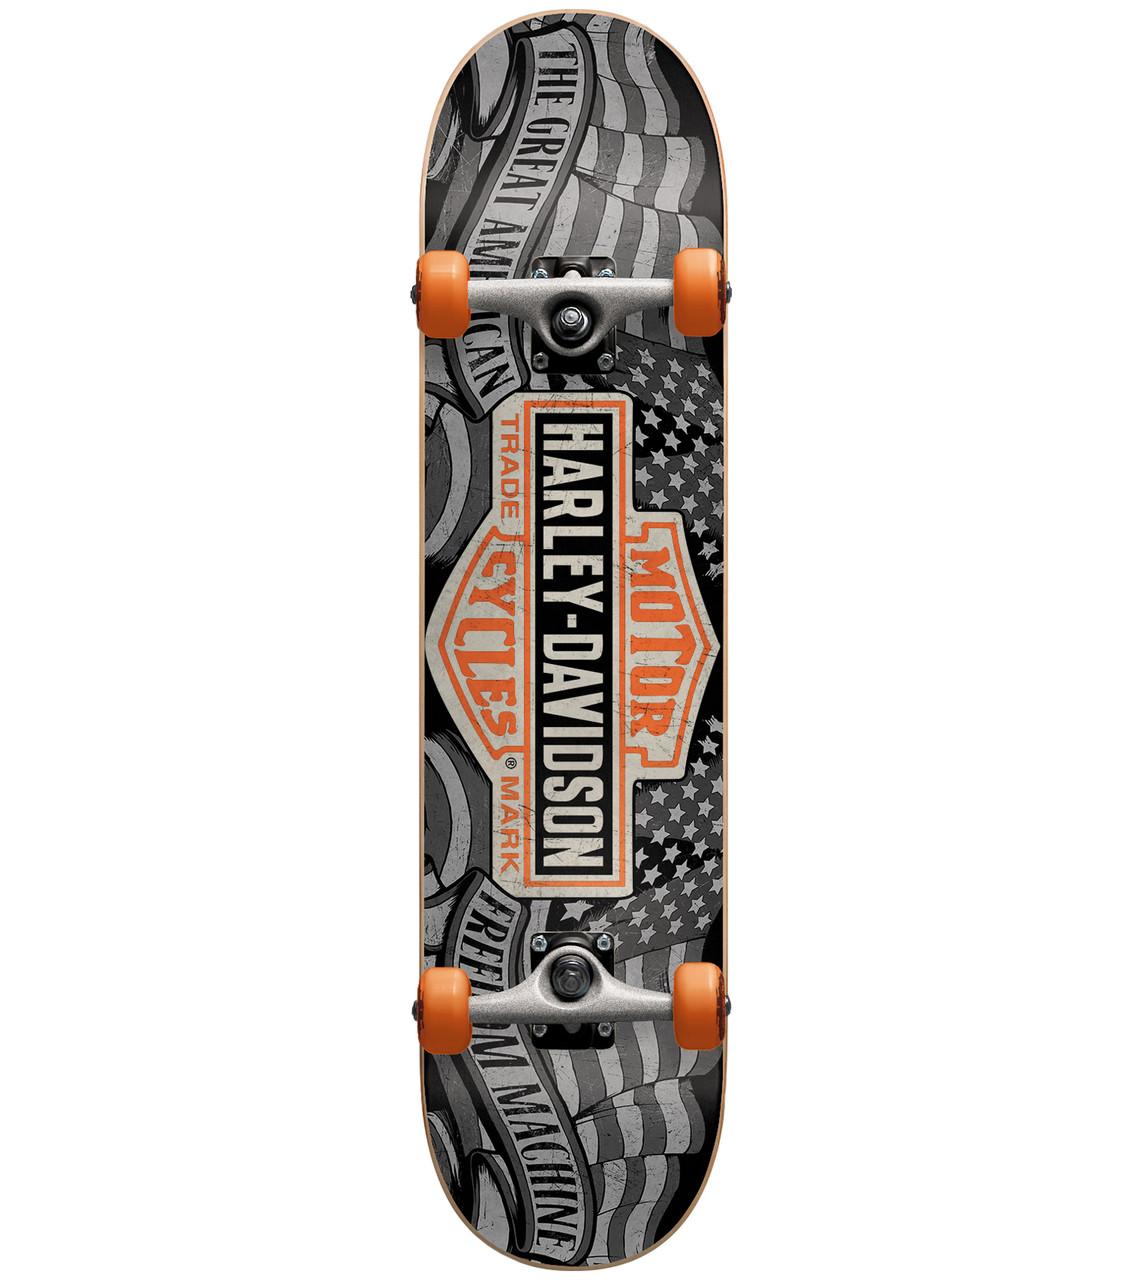 "DARKSTAR//HARLEY DAVIDSON FREEDOM Planche Skateboard 7.875/"" large Dark Star"